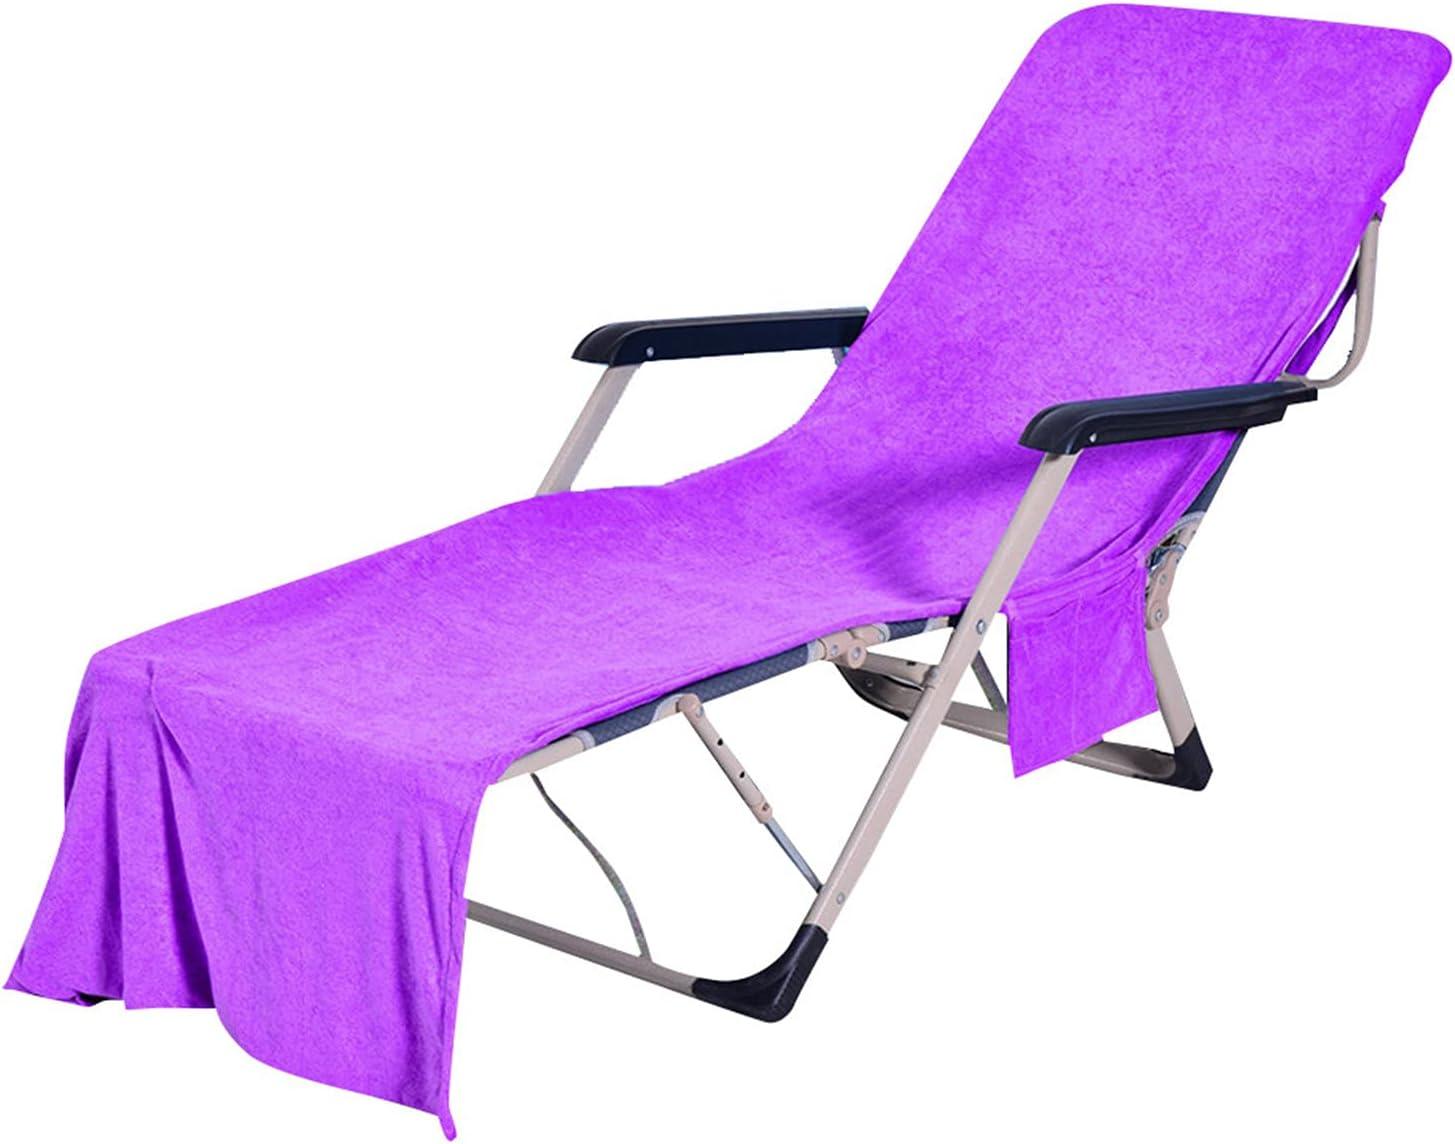 Beach Chair Cover Tucson Mall Lounge Towel Ranking TOP10 Microfiber Poo